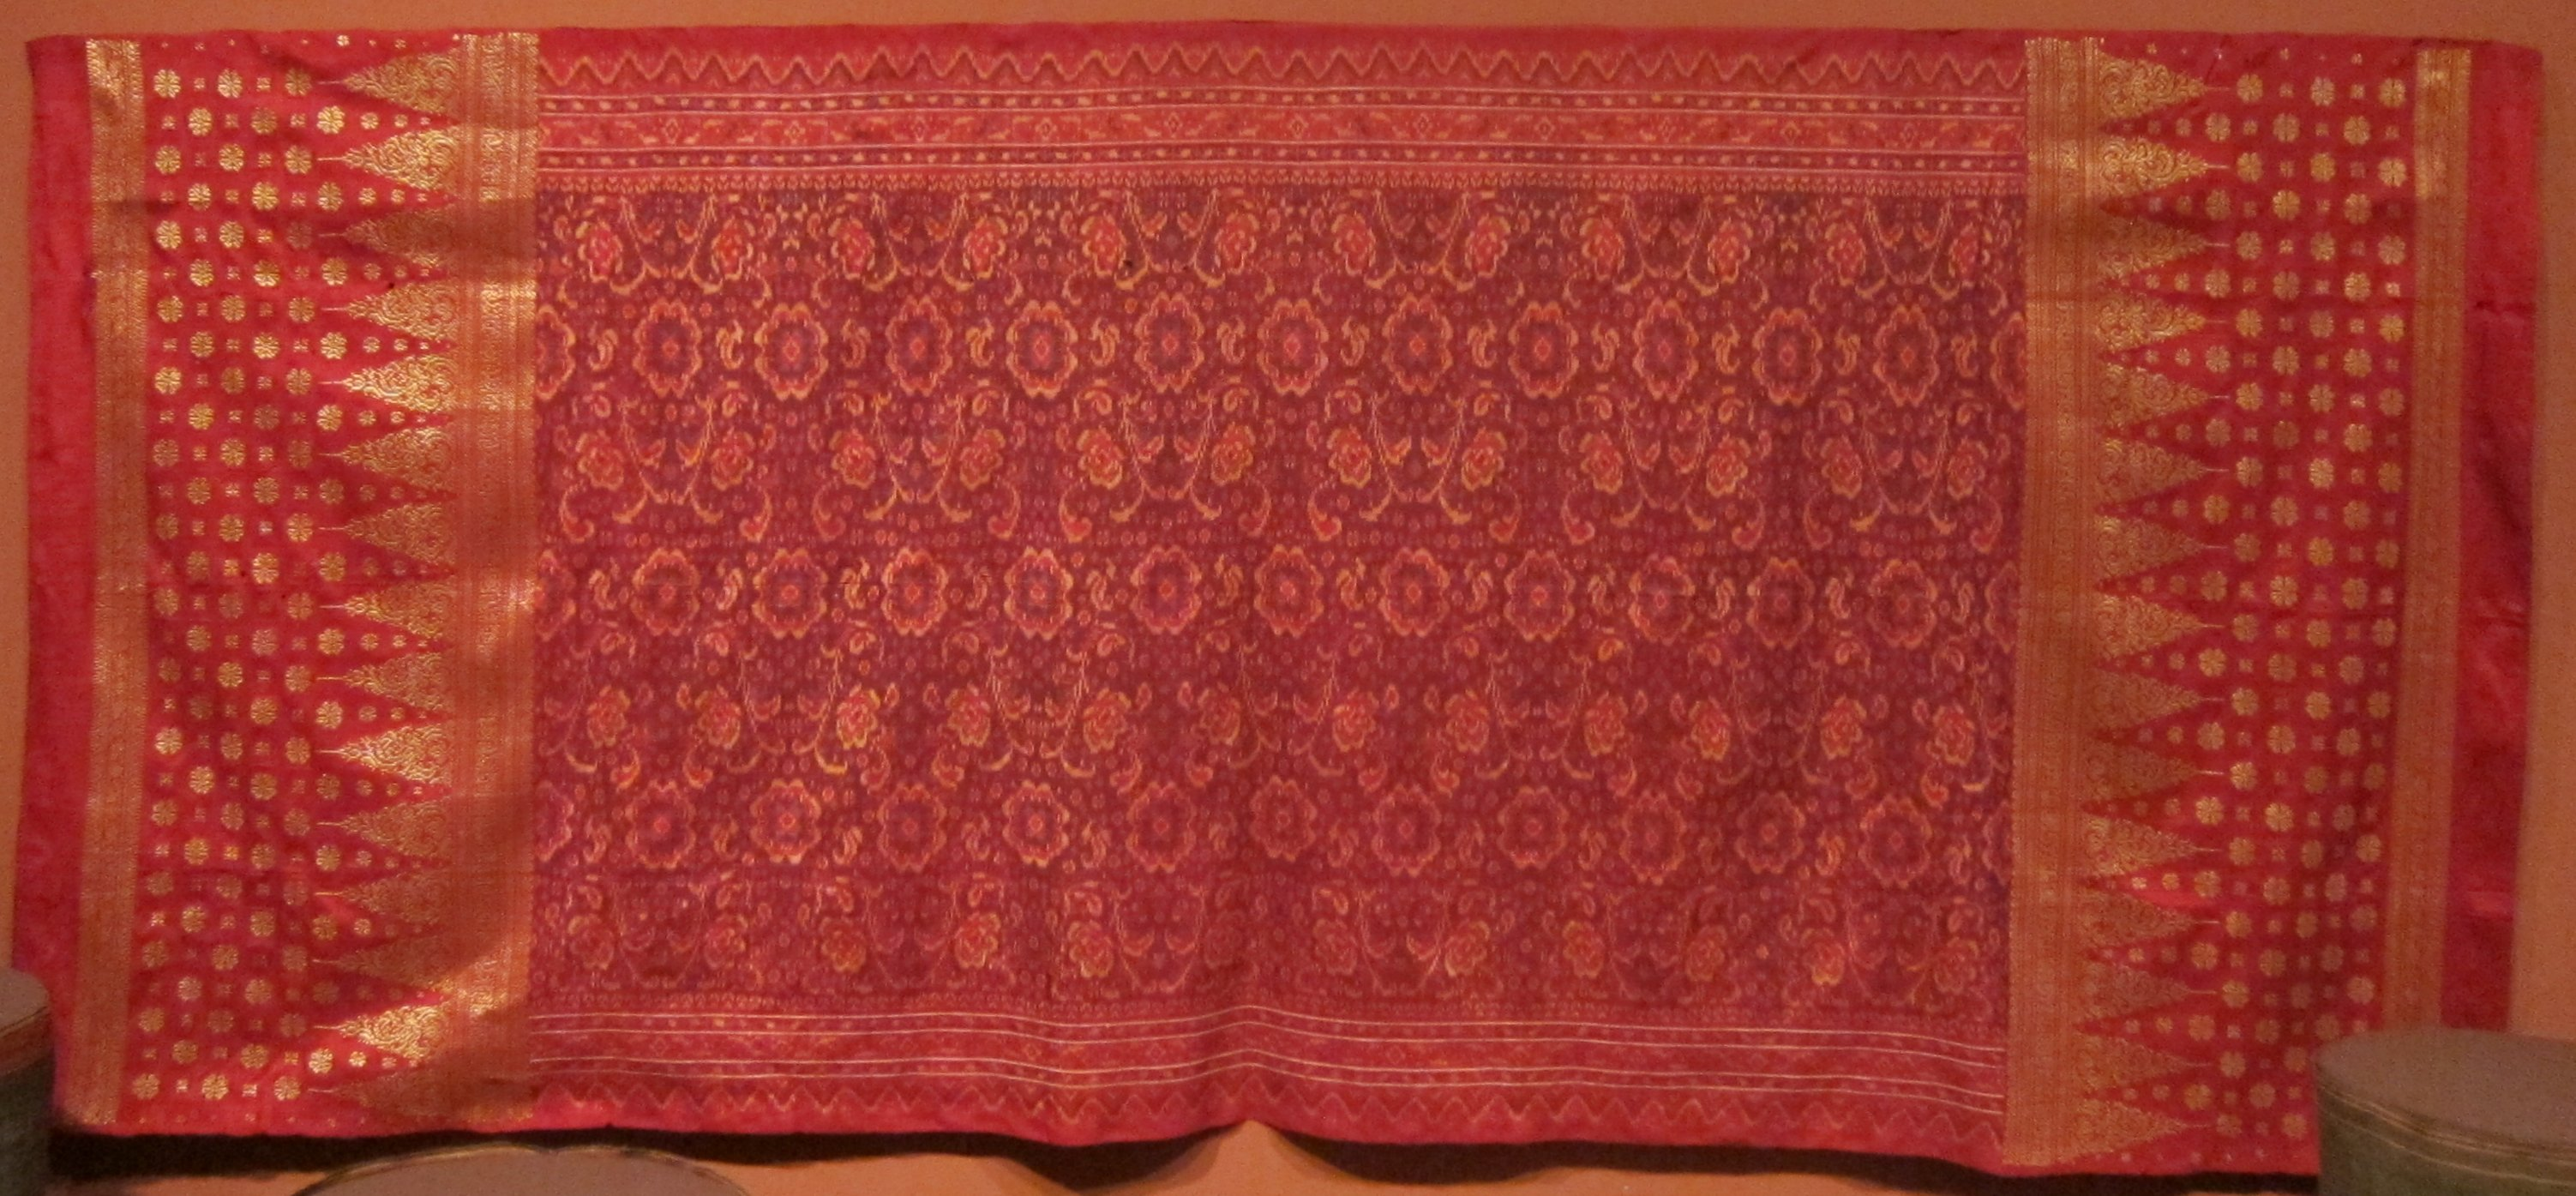 File Kain Limar Shoulder Cloth From Sumatra Bangka